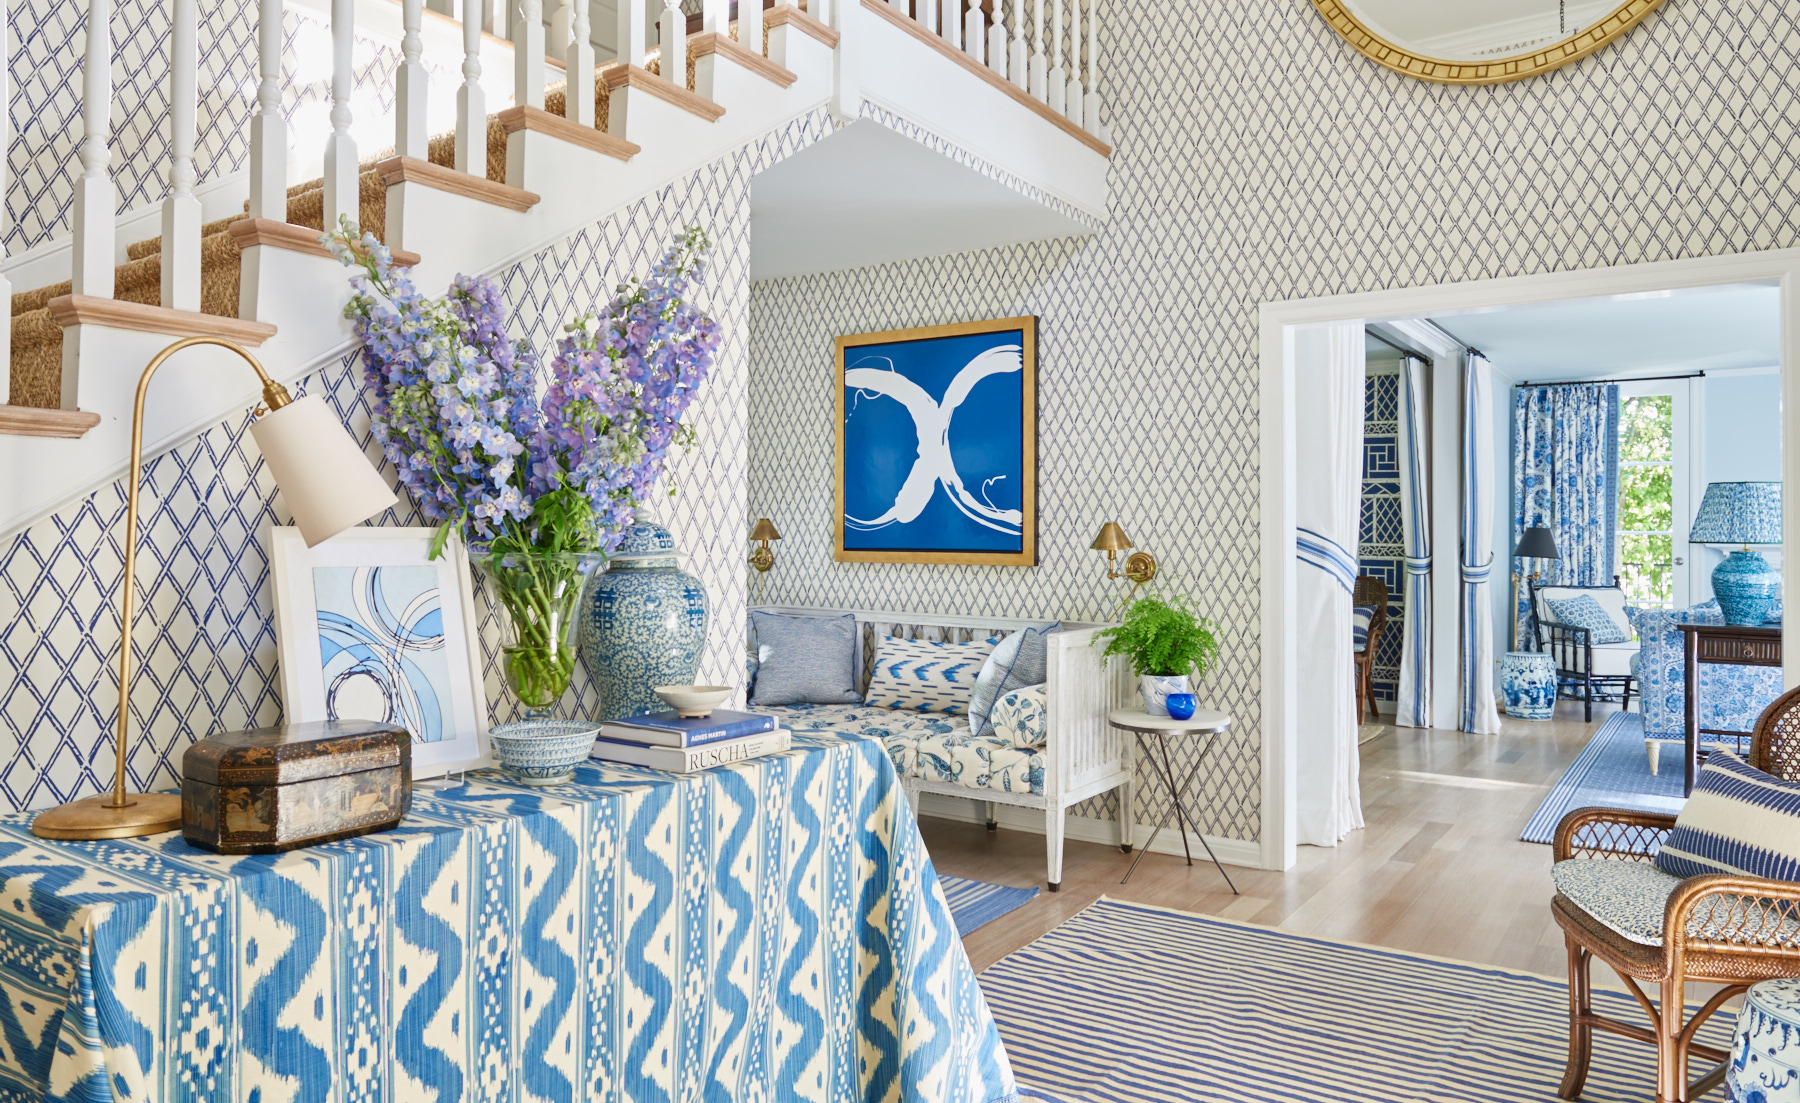 Custom blue print tablecloth